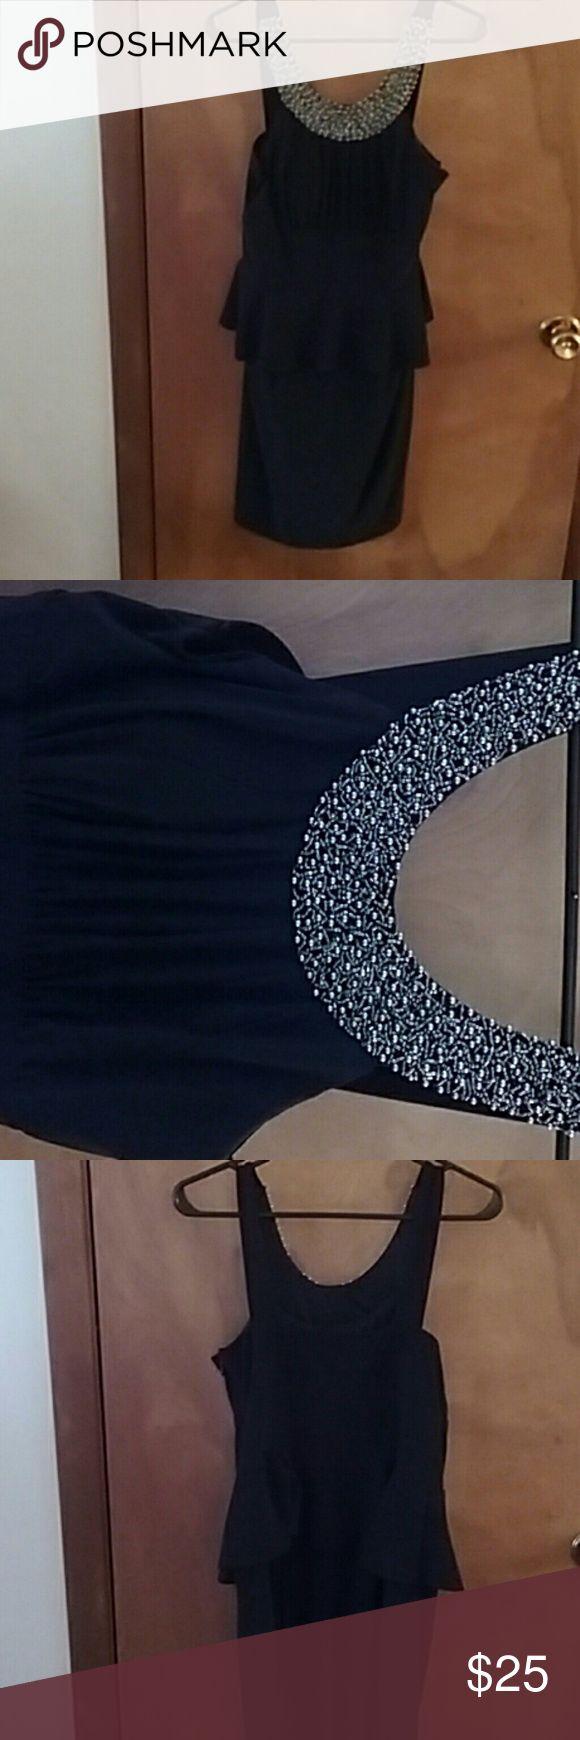 Black peplum dress Sleeveless black peplum dress with a beaded neckline, only worn once! Jackie Jon Dresses Midi